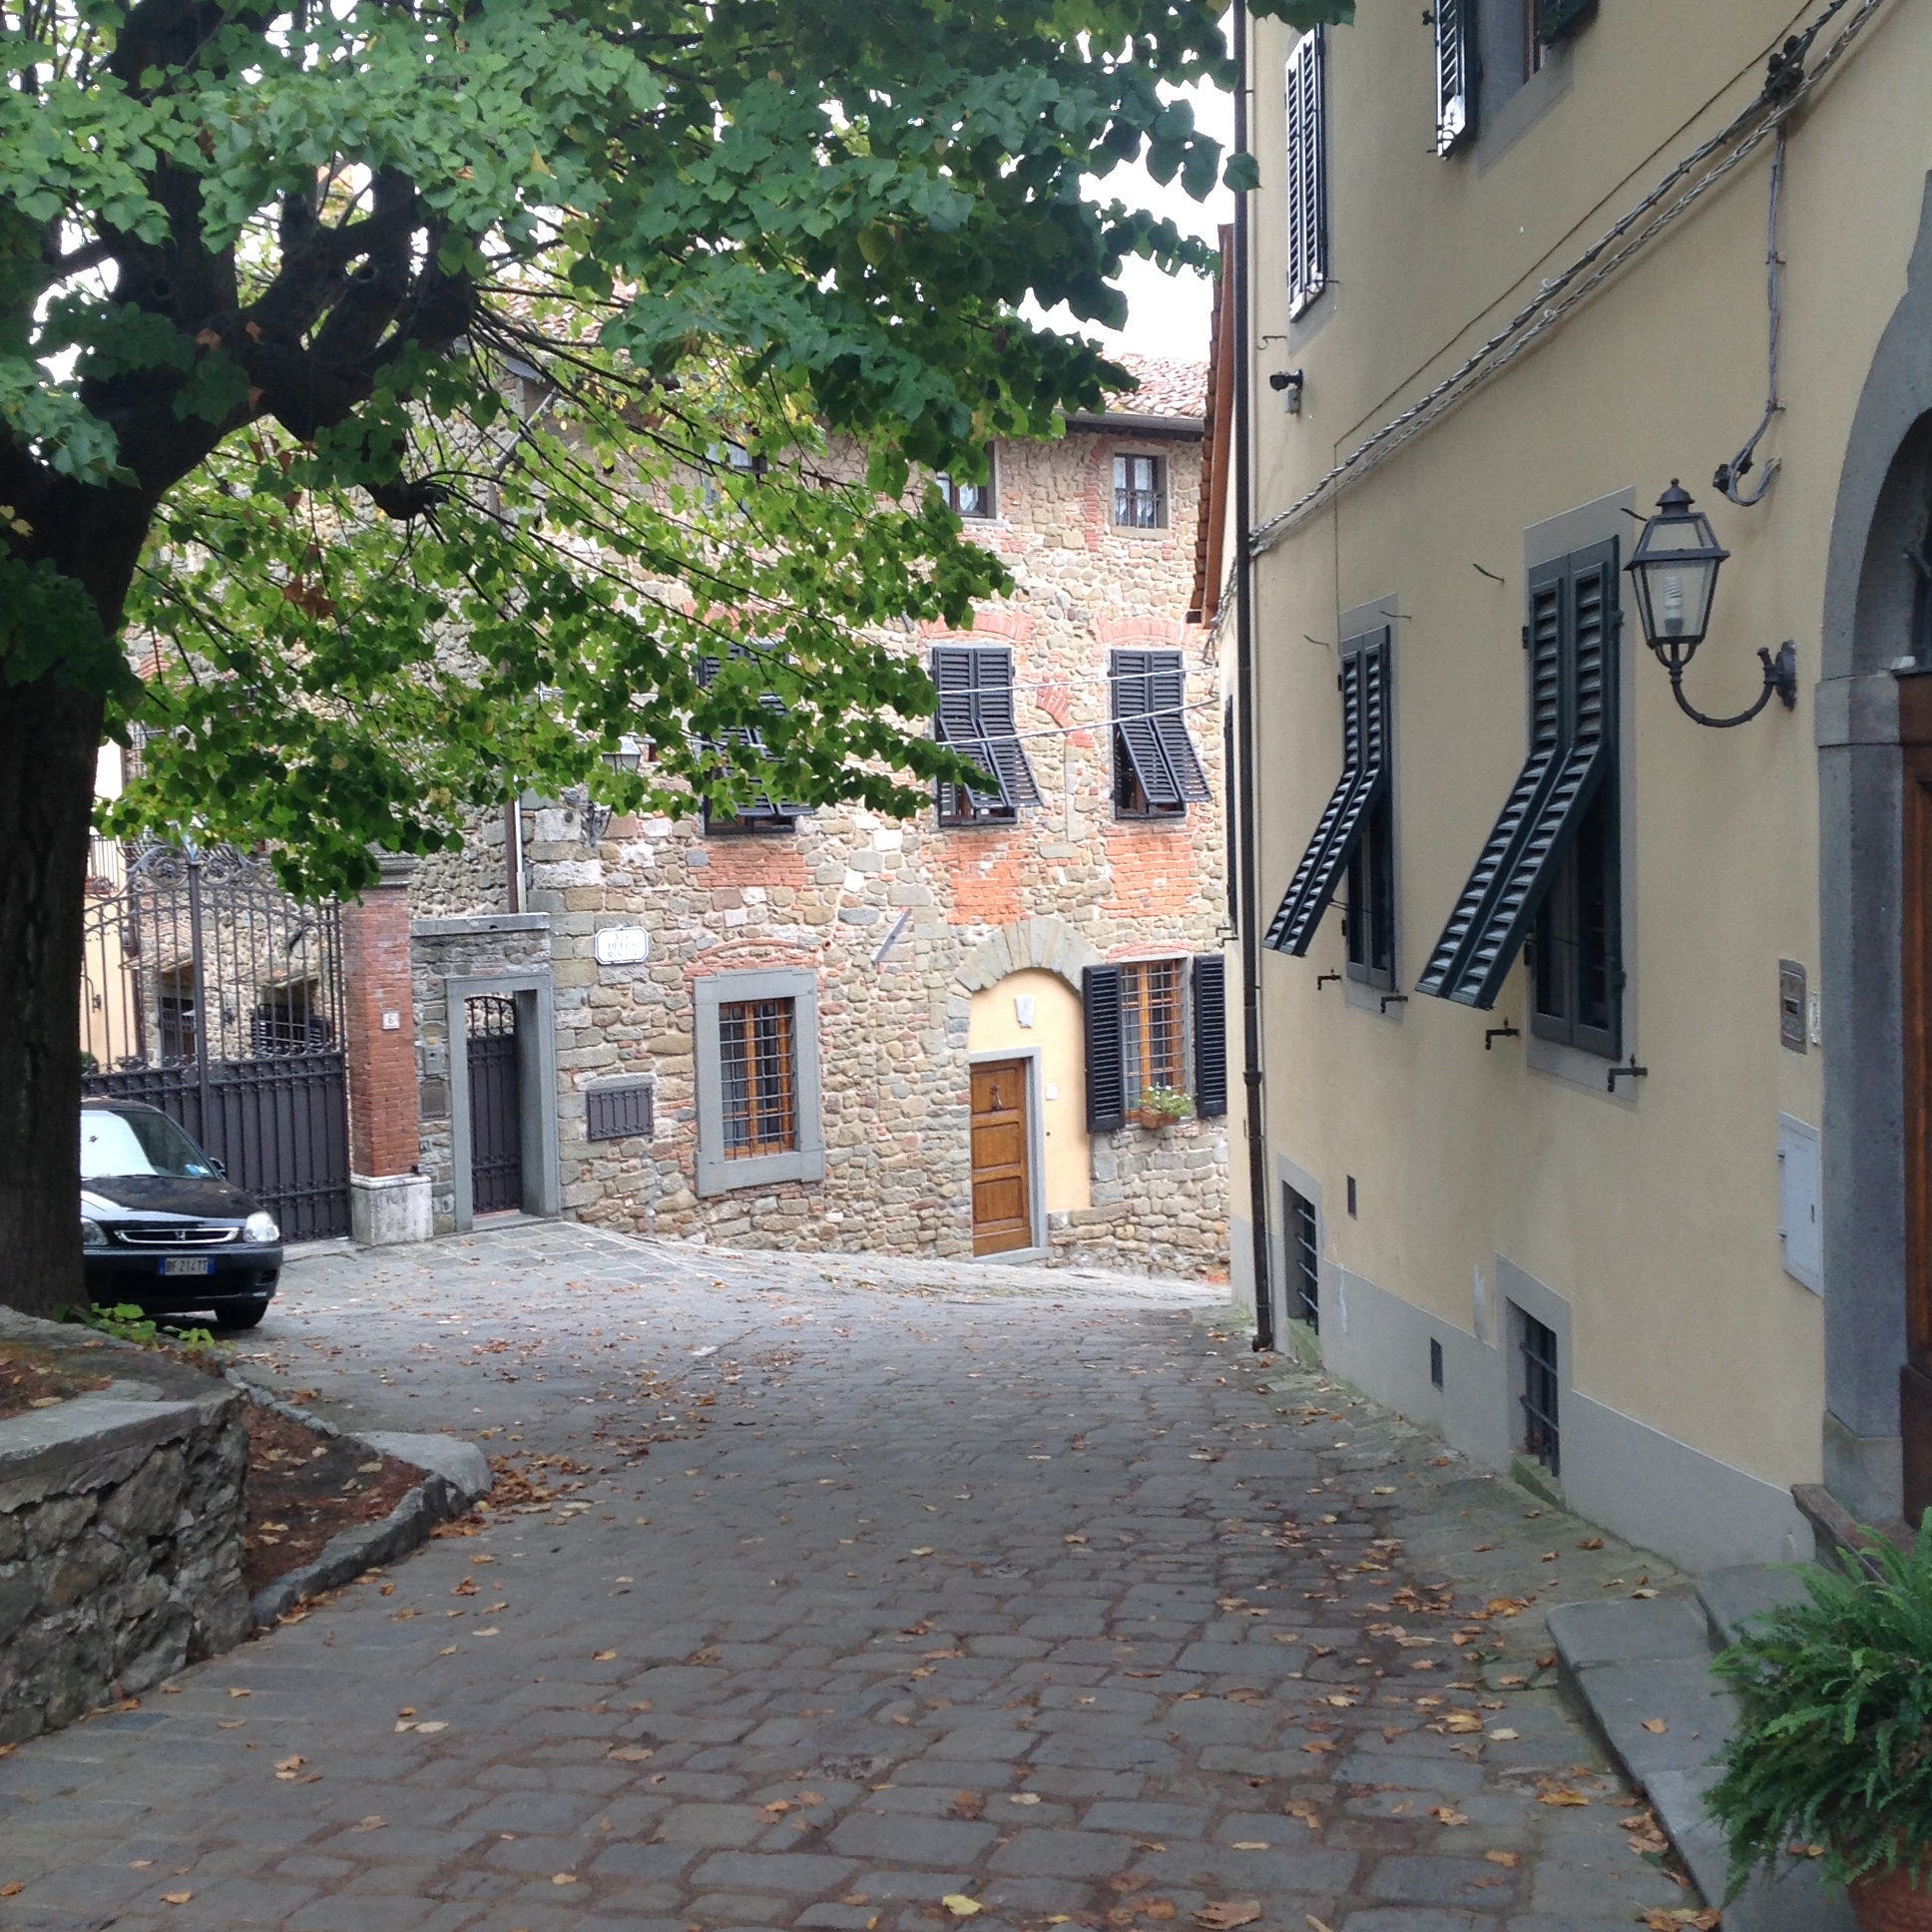 Streets of Montecatini Alto